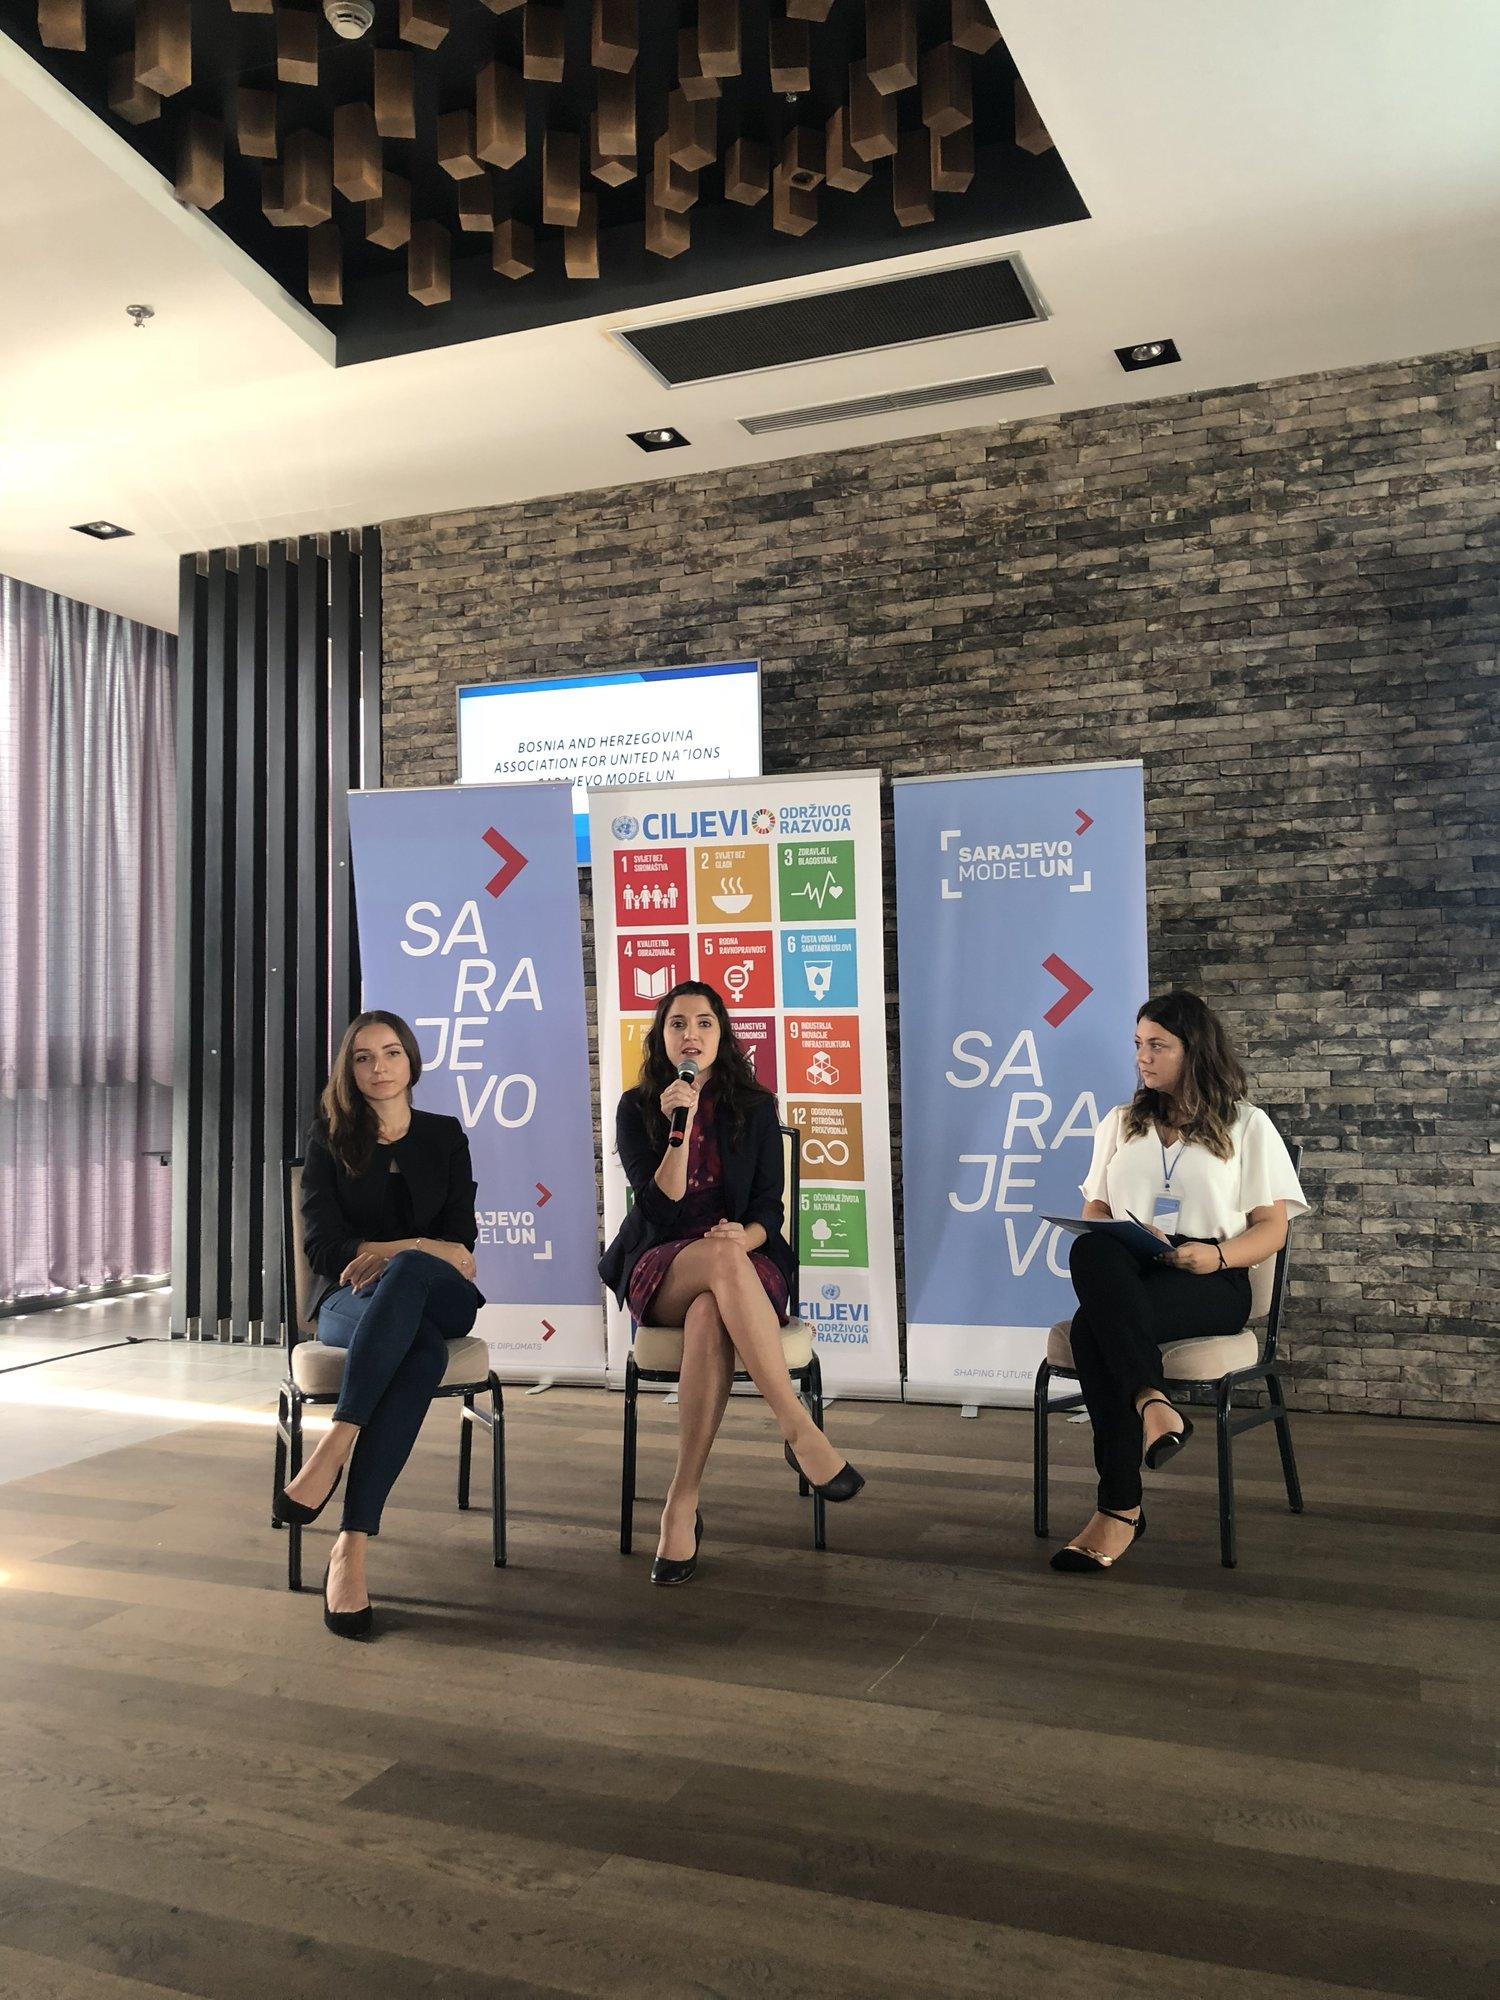 From left to right:  Dafina Peci, Western Balkans Youth Cooperation Platform  Sabina Carli, Former UN Youth Delegate of Slovenia  Meliha Muherina, Vice-President, Bosnia and Herzegovina Association for United Nations